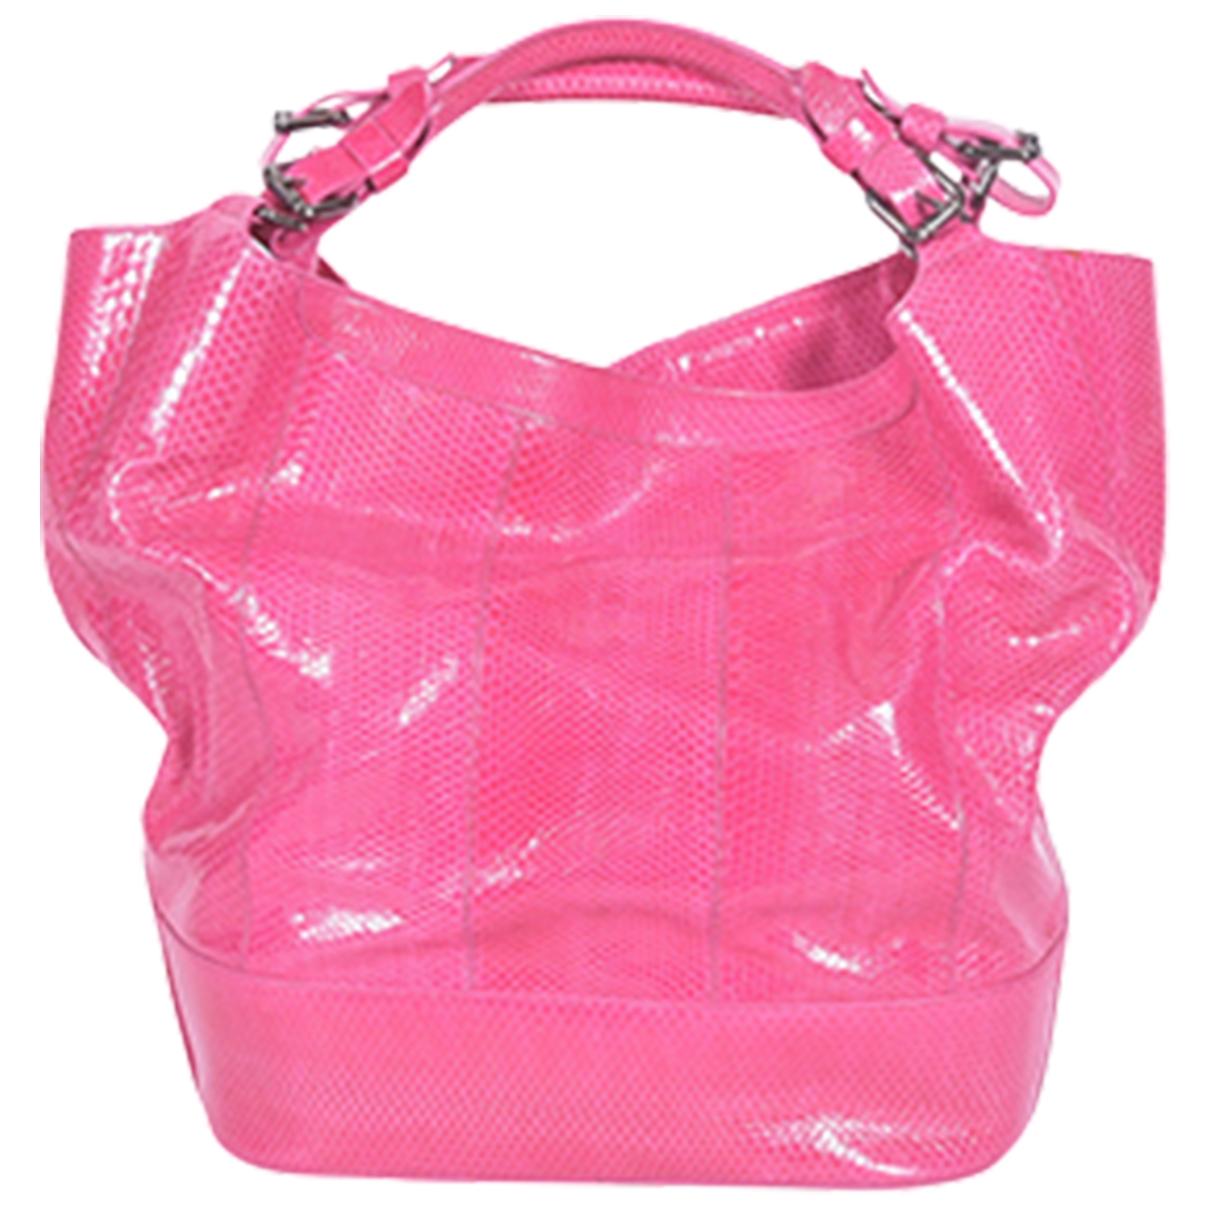 Jil Sander \N Pink Python handbag for Women \N